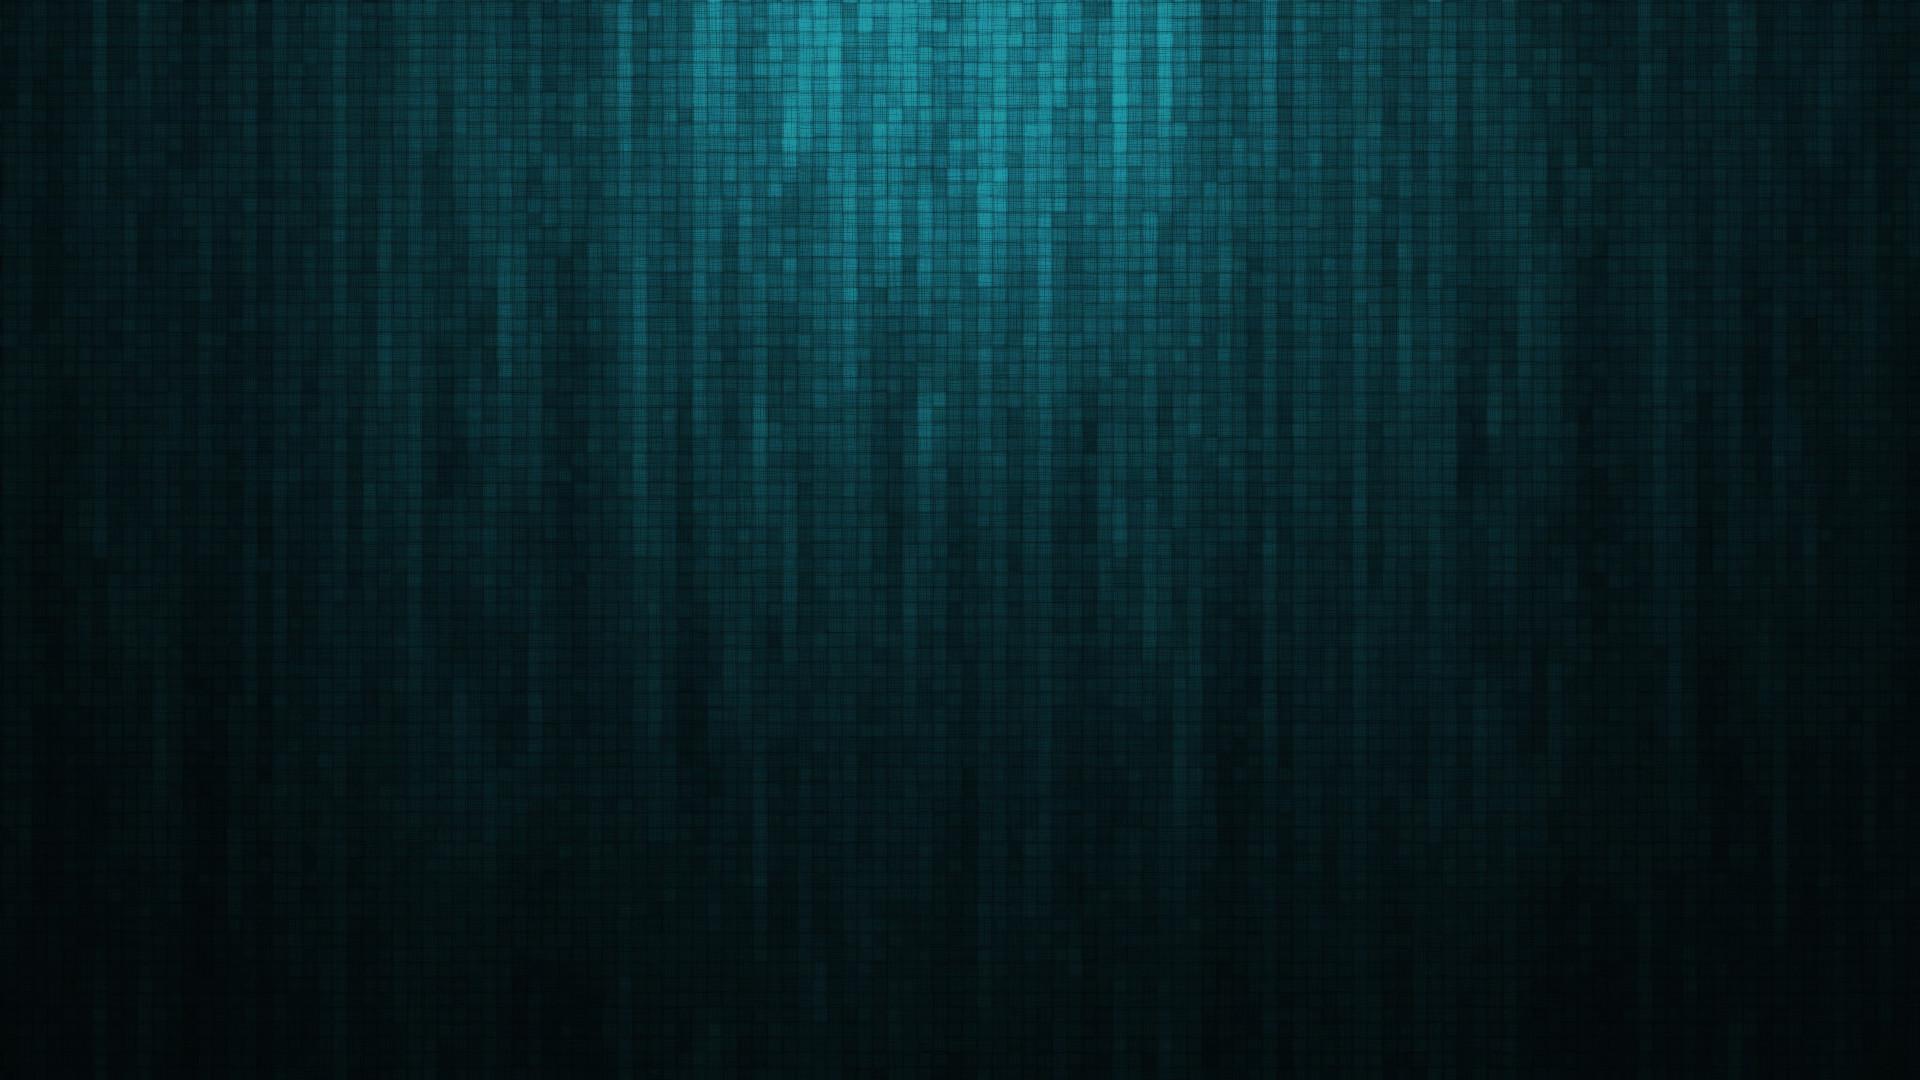 Basic Blue Wallpaper by BlackLotusXX Basic Blue Wallpaper  by BlackLotusXX